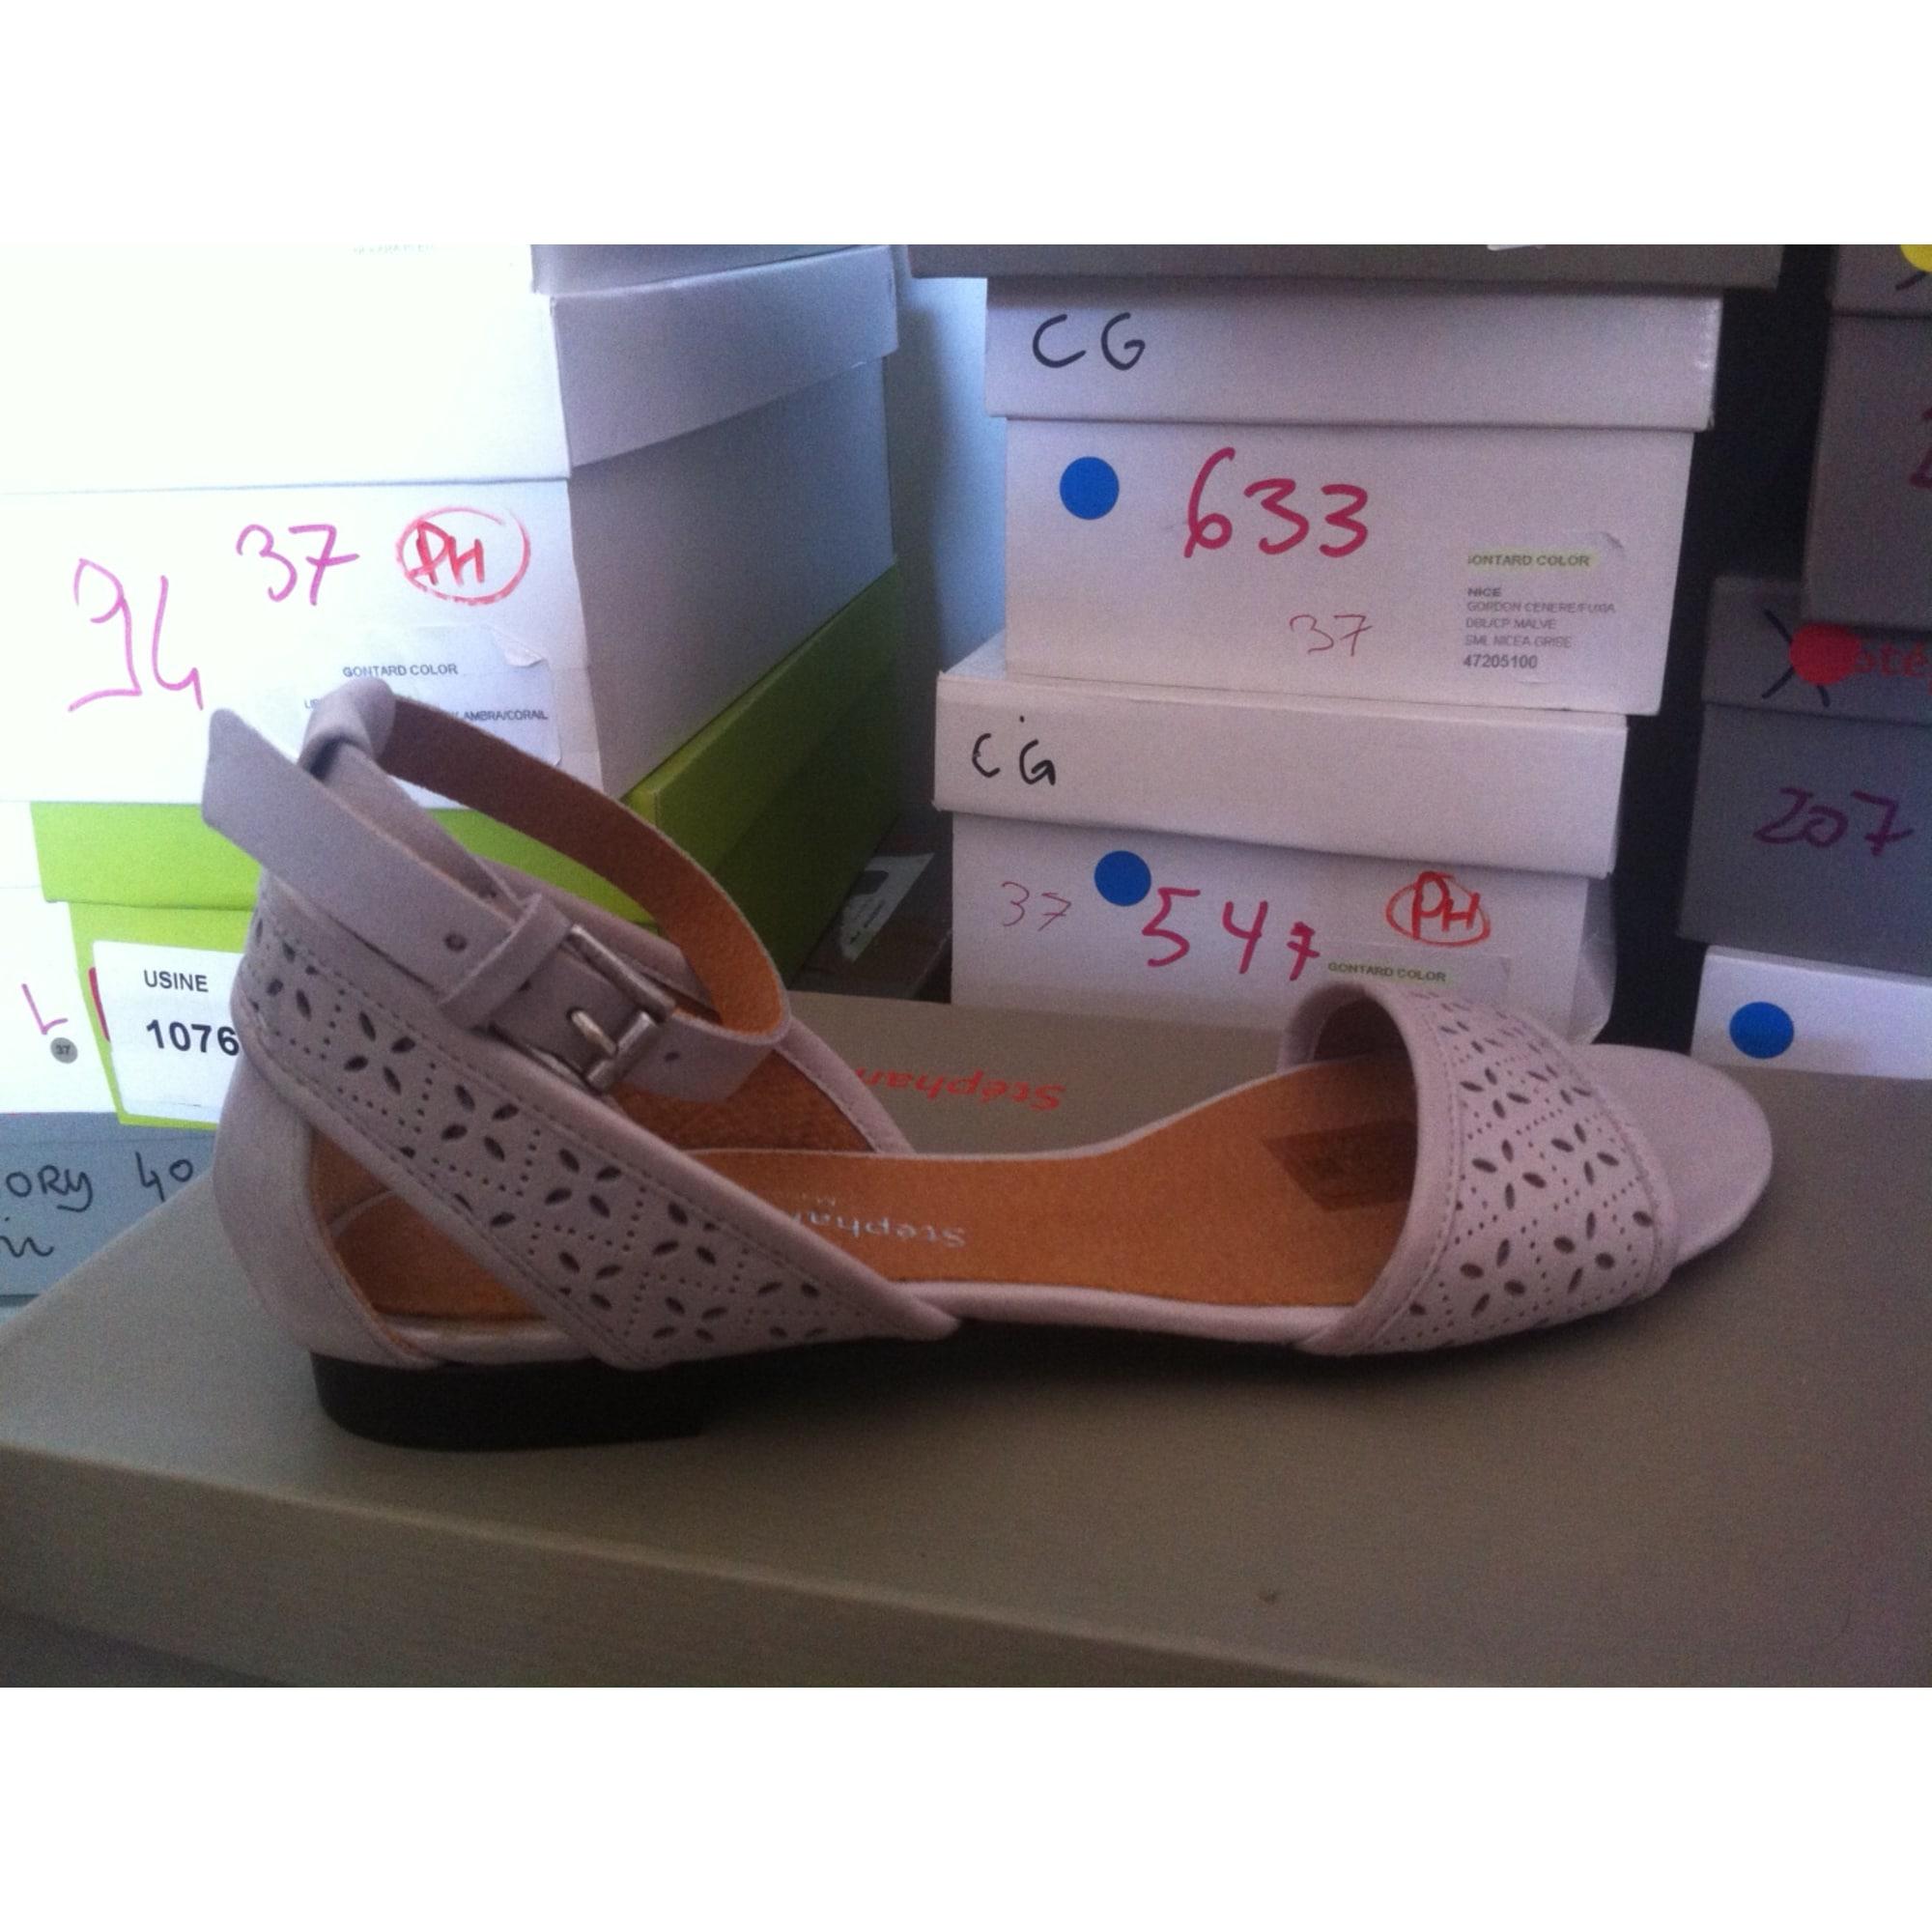 Sandales plates  STÉPHANE GONTARD Gris, anthracite